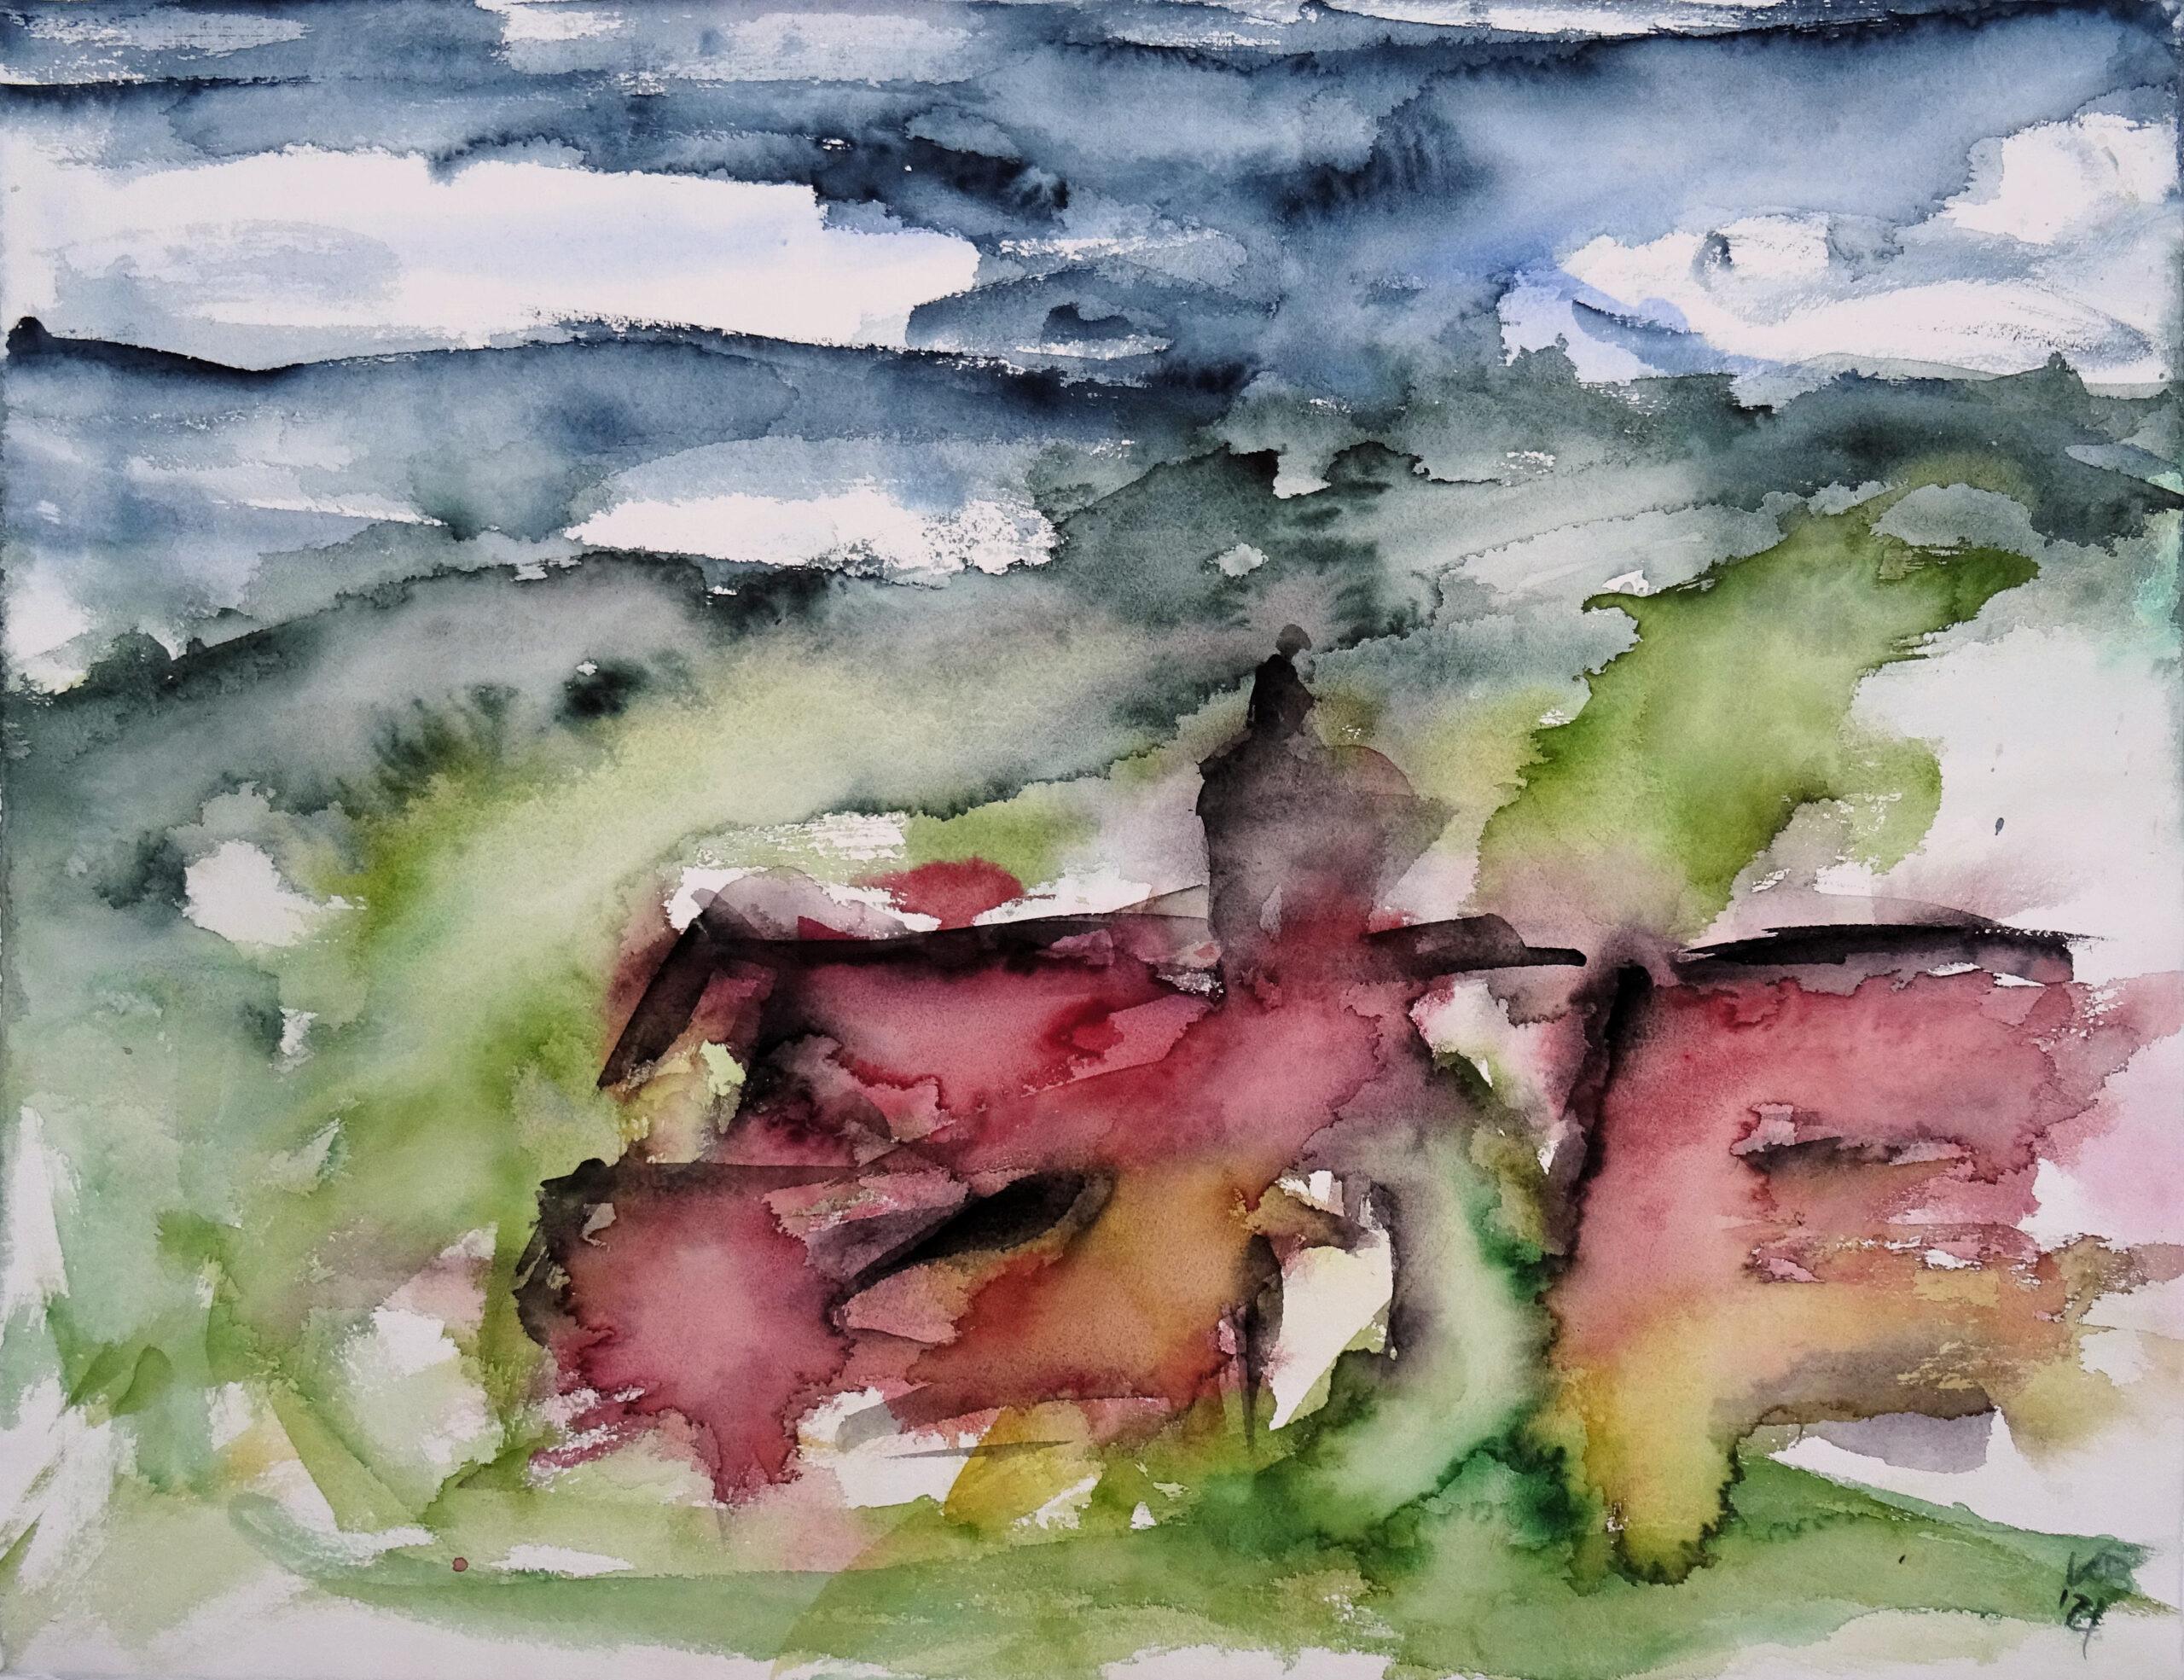 Blick auf Wernswig, Watercolour 65 x 50 cm, © 2021 by Klaus Bölling